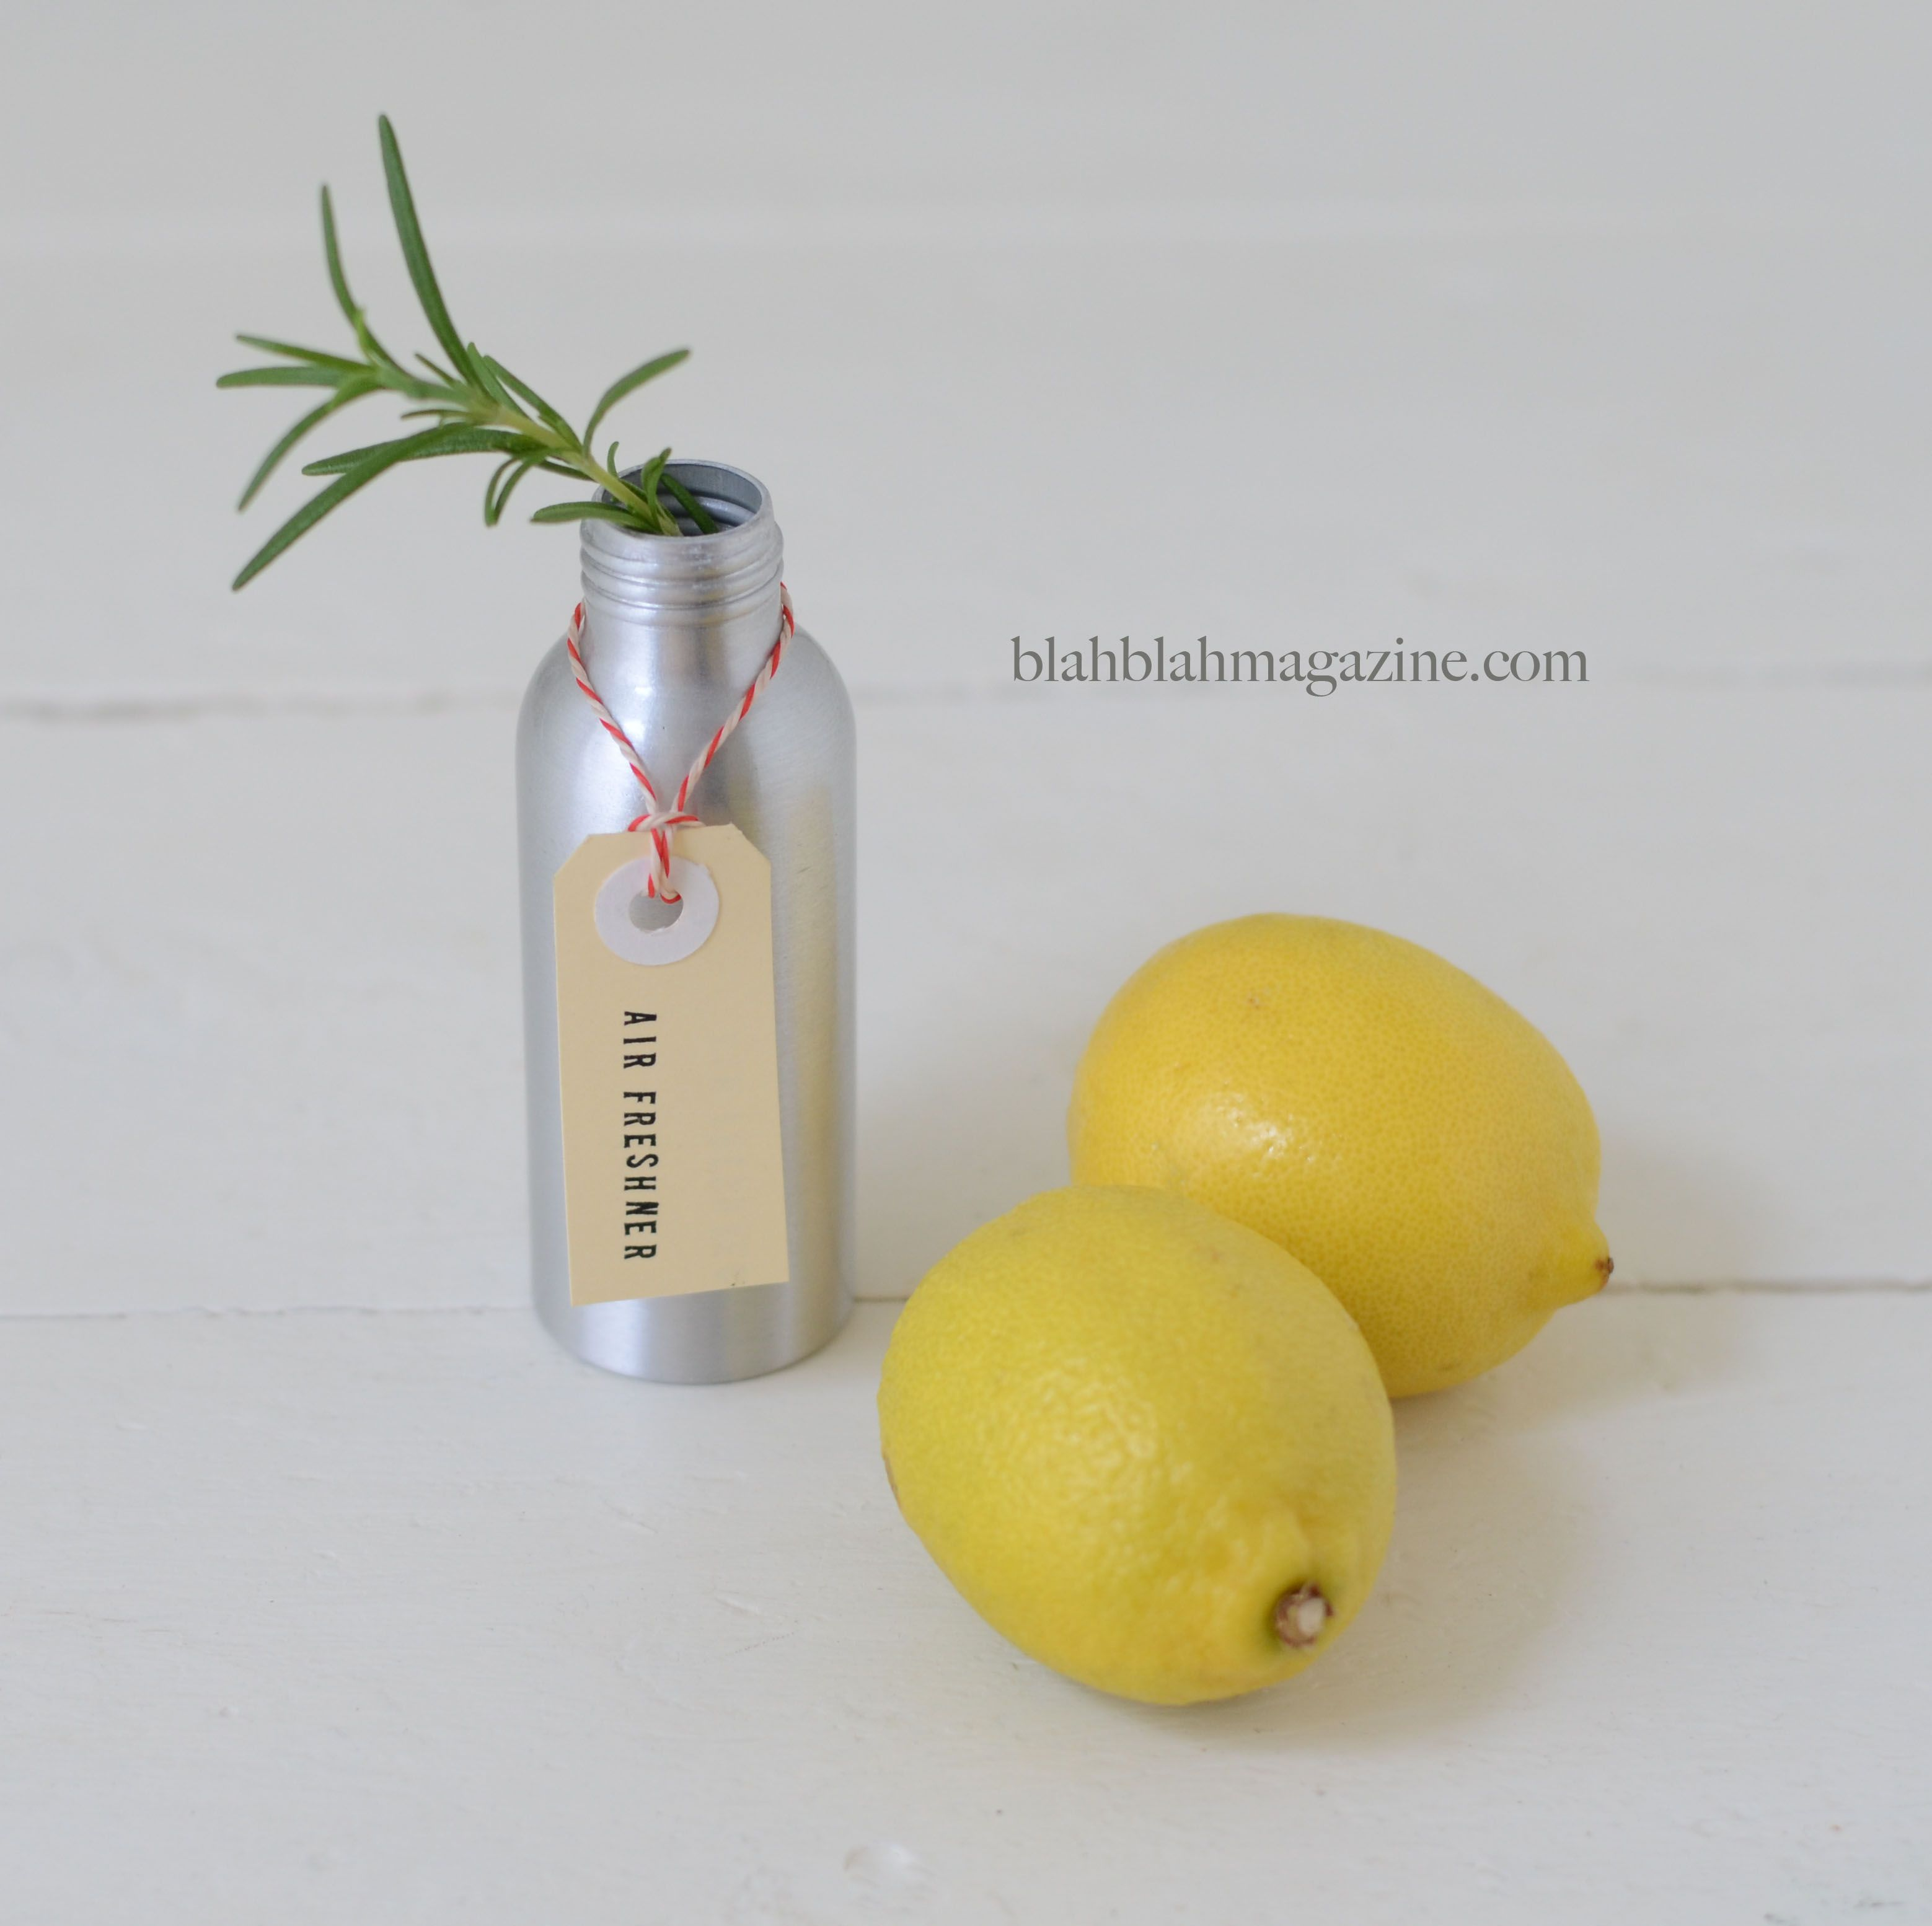 Rosemary & Lemon Air Freshenercybele Where Would A Bathroom Be Mesmerizing Bathroom Fresheners 2018